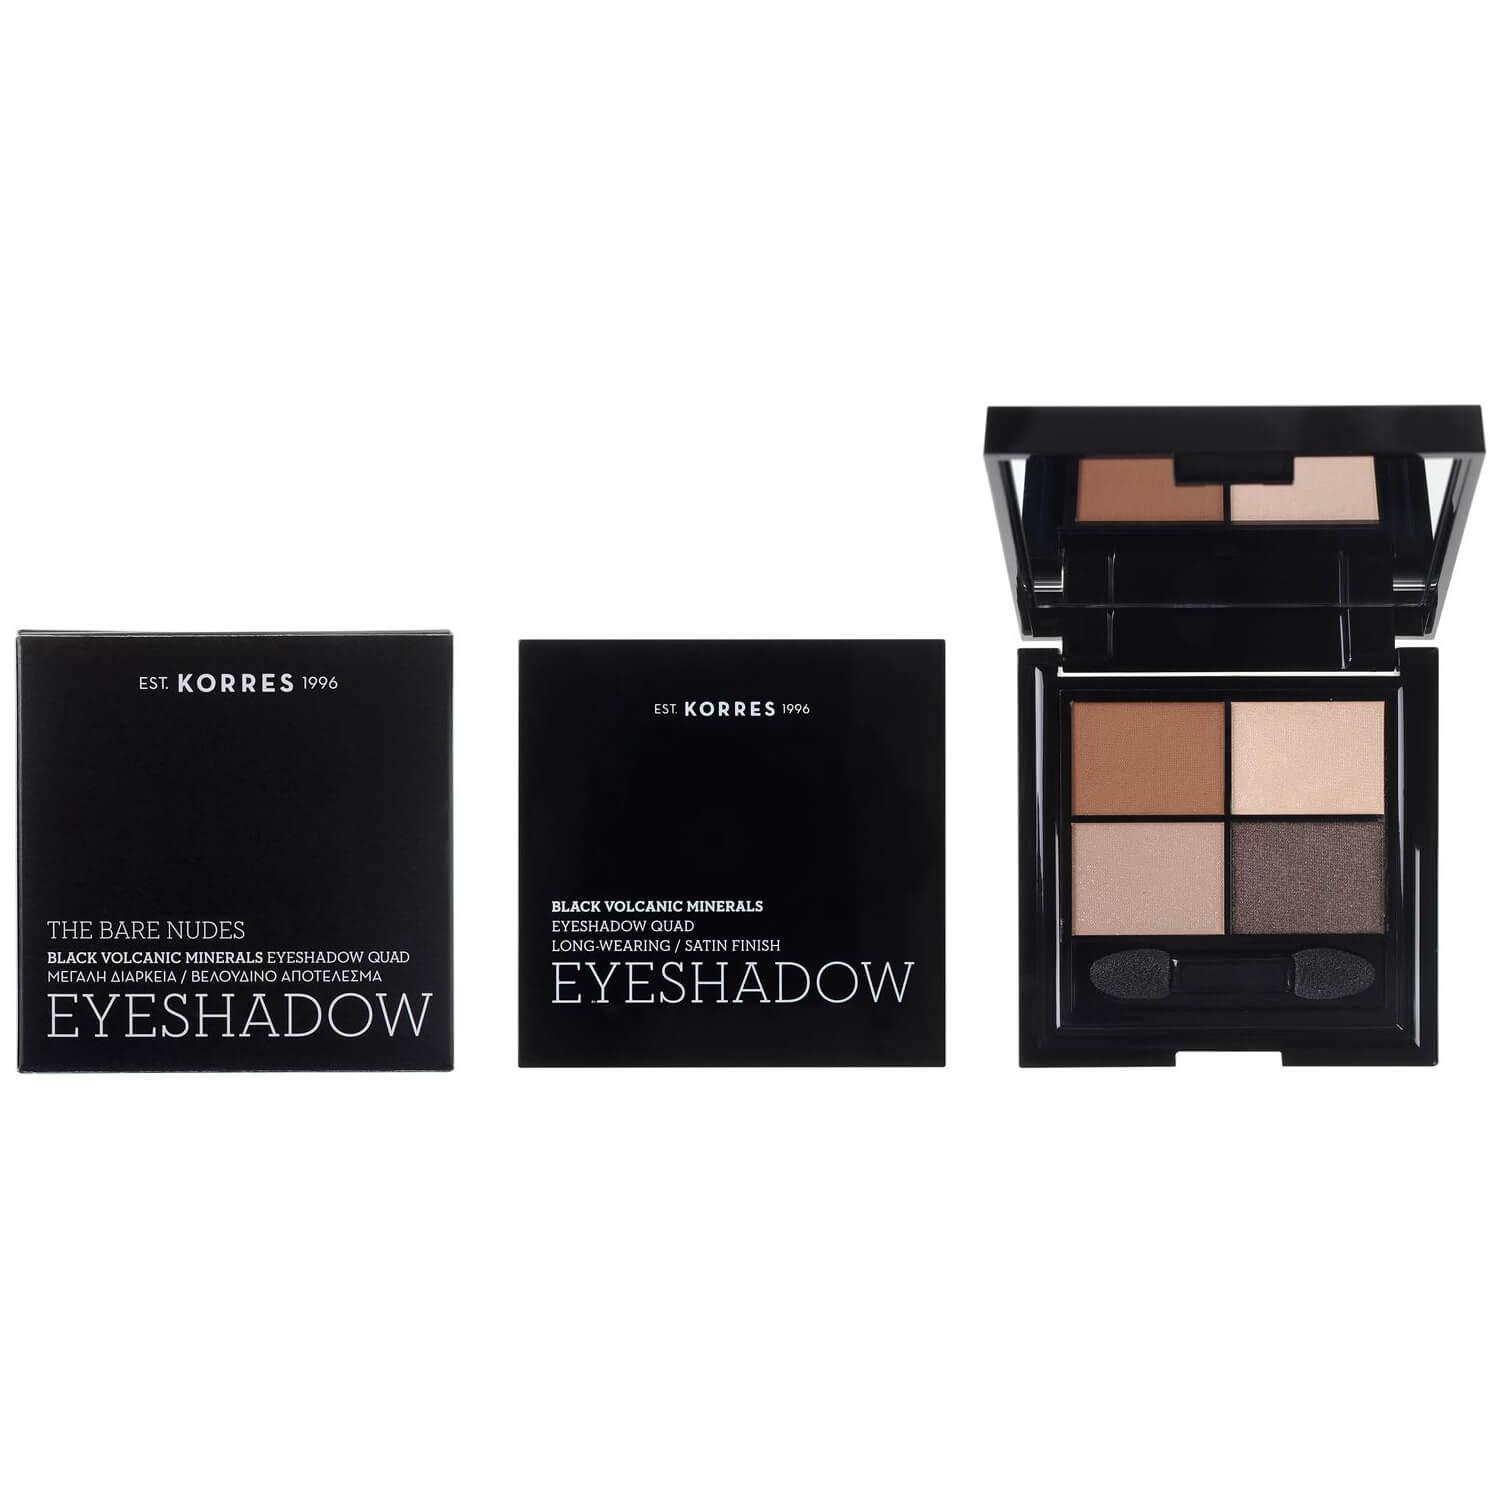 Korres Black Volcanic Minerals Eyeshadow Palette Satin Finish The Bare Nudes Κρεμώδη Υφή Μεγάλης Διάρκειας 5g